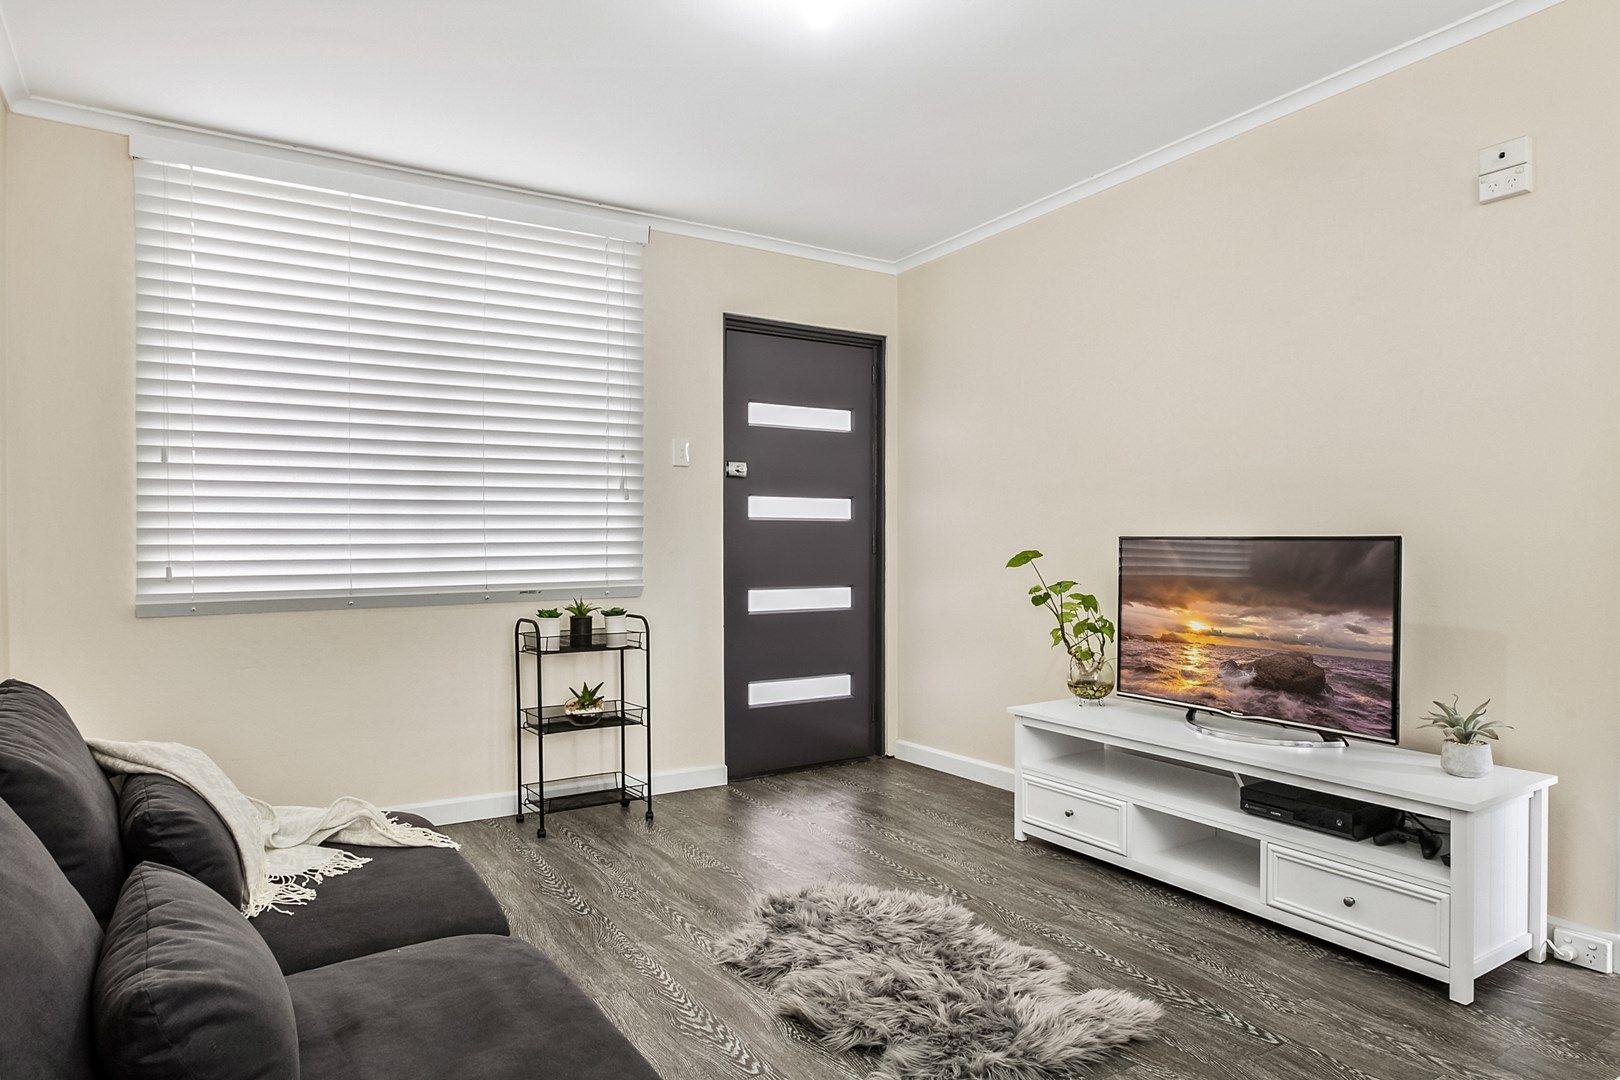 4/12 Caronia Avenue, Cronulla NSW 2230, Image 1